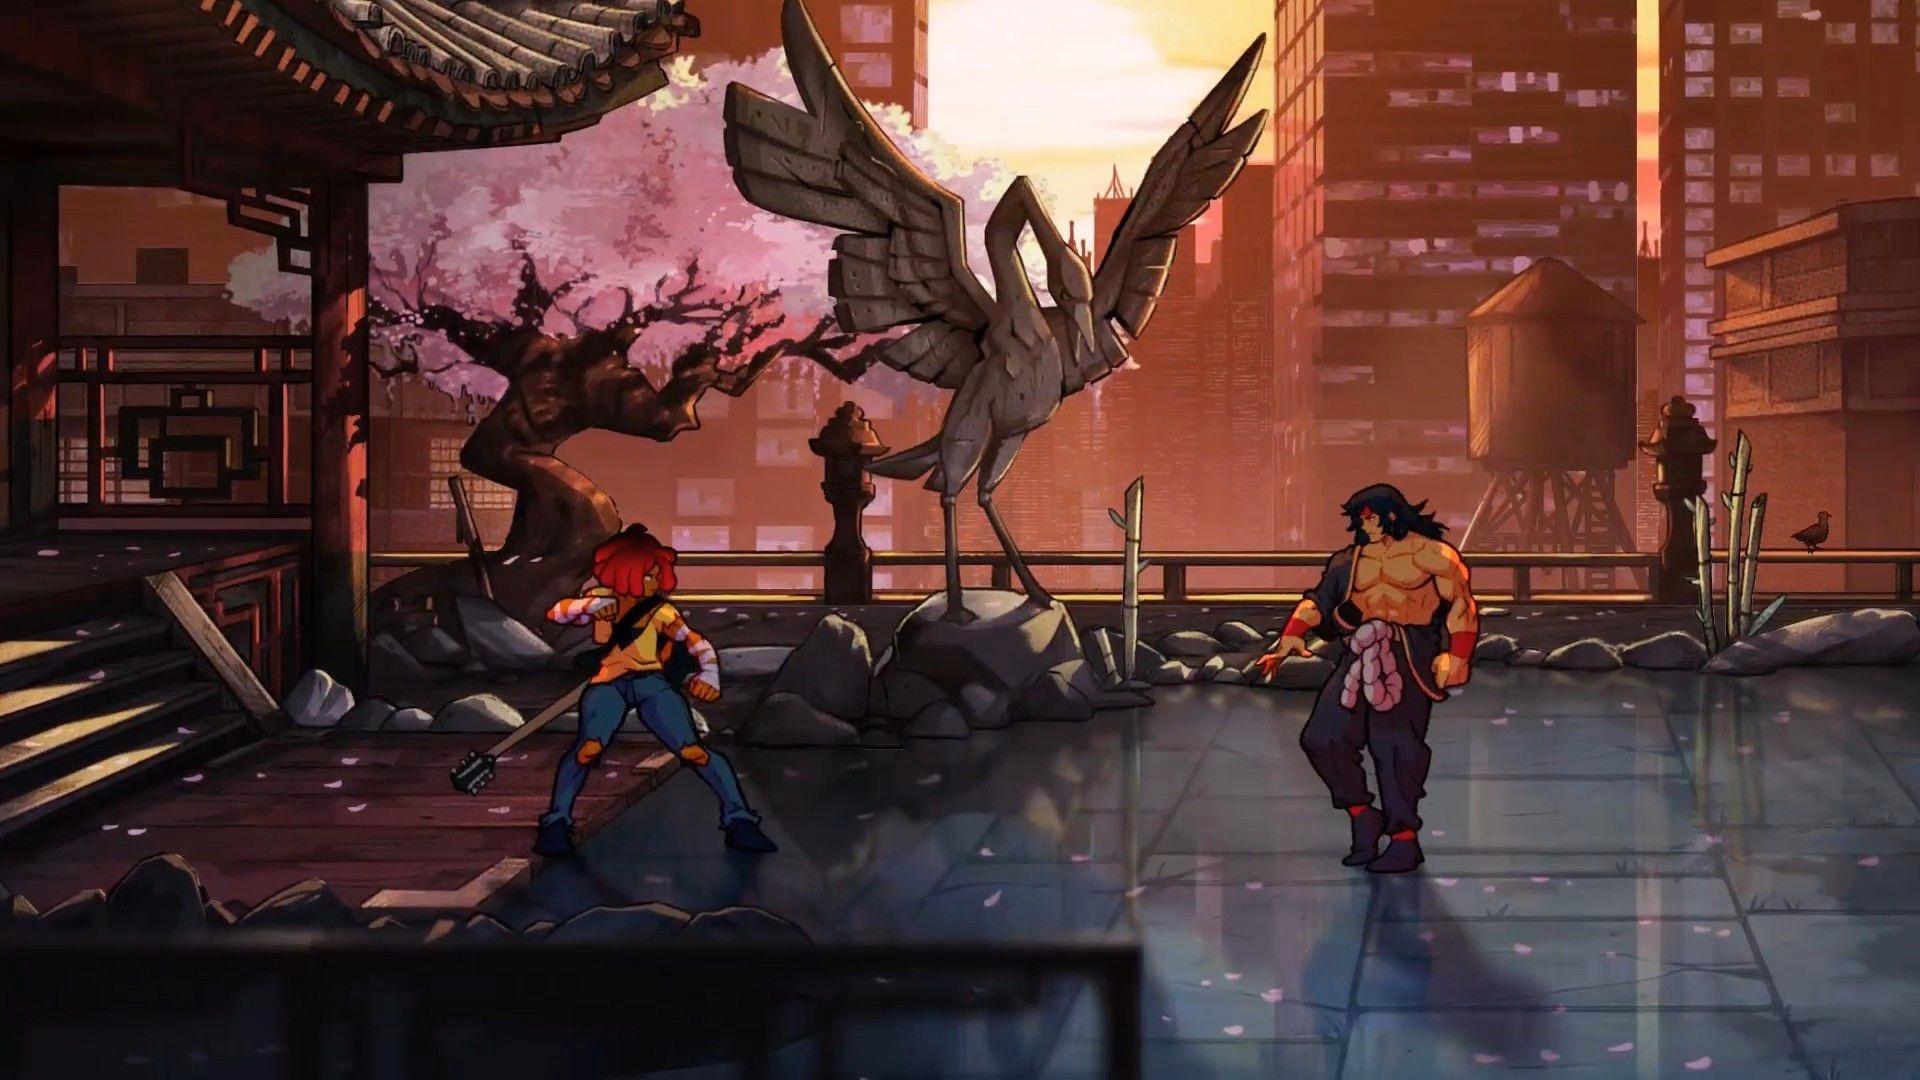 8 минут геймплея Streets of Rage 4: Черри Хантер в деле